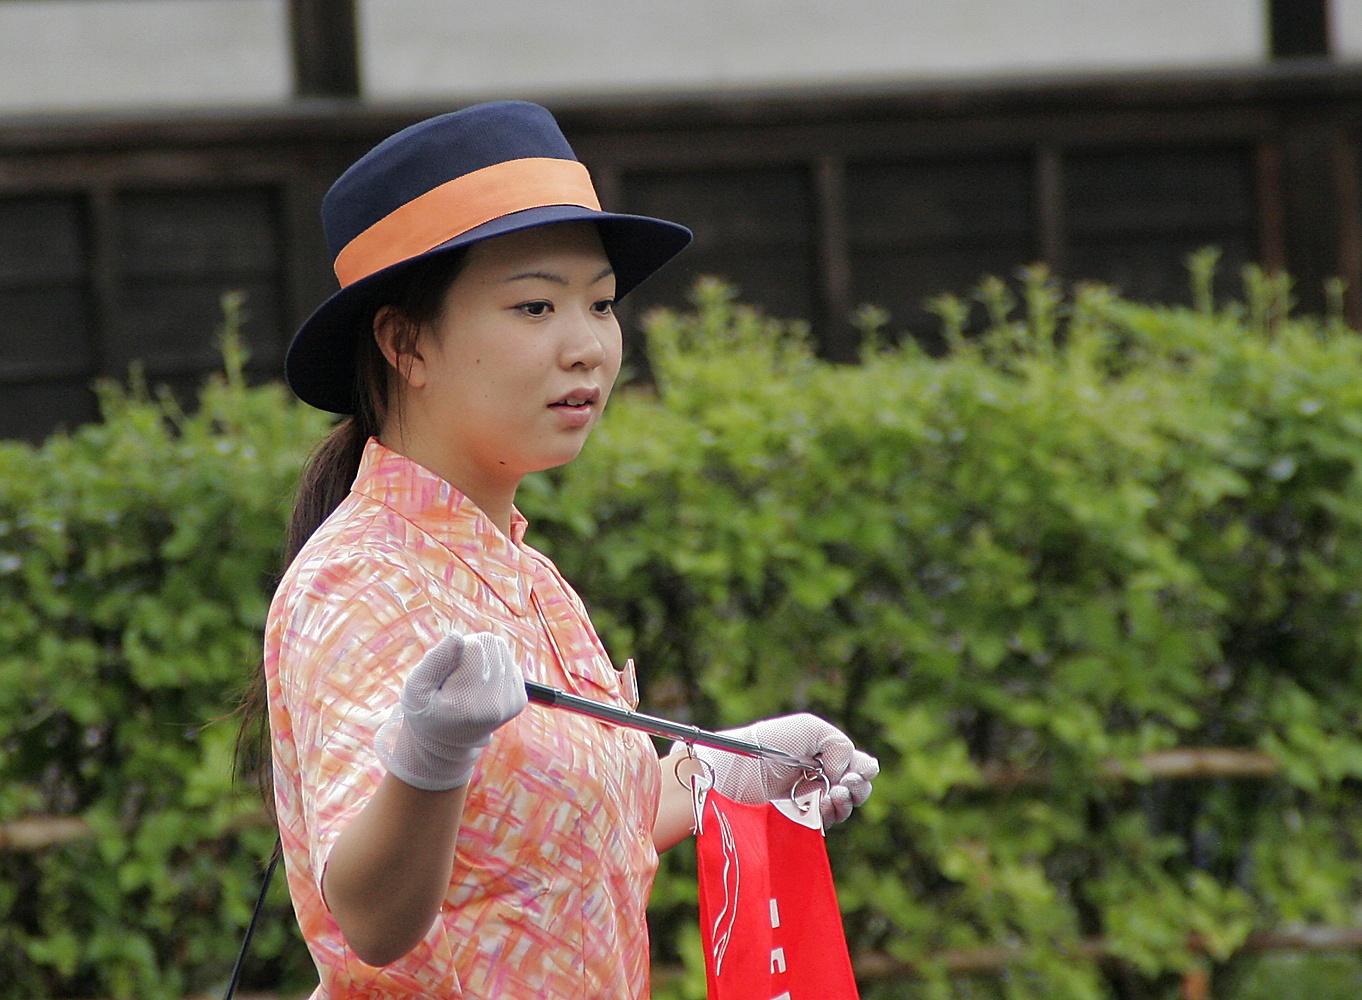 Takayama Tour Guide by Carl Main